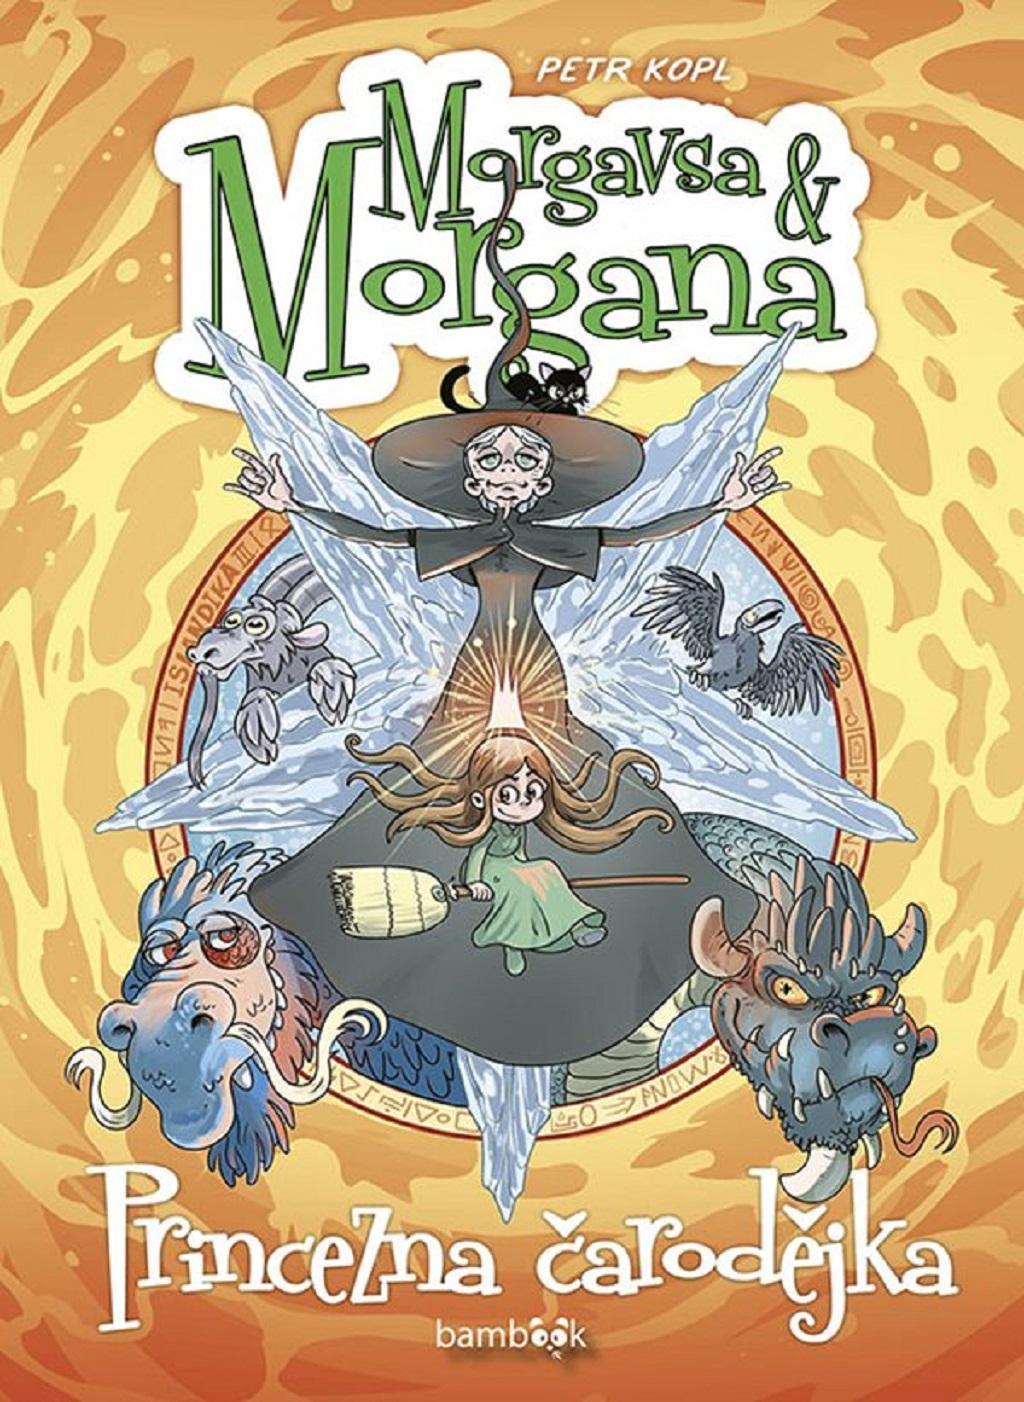 Petr Kopl / Morgavsa & Morgana: Princezna čarodějka